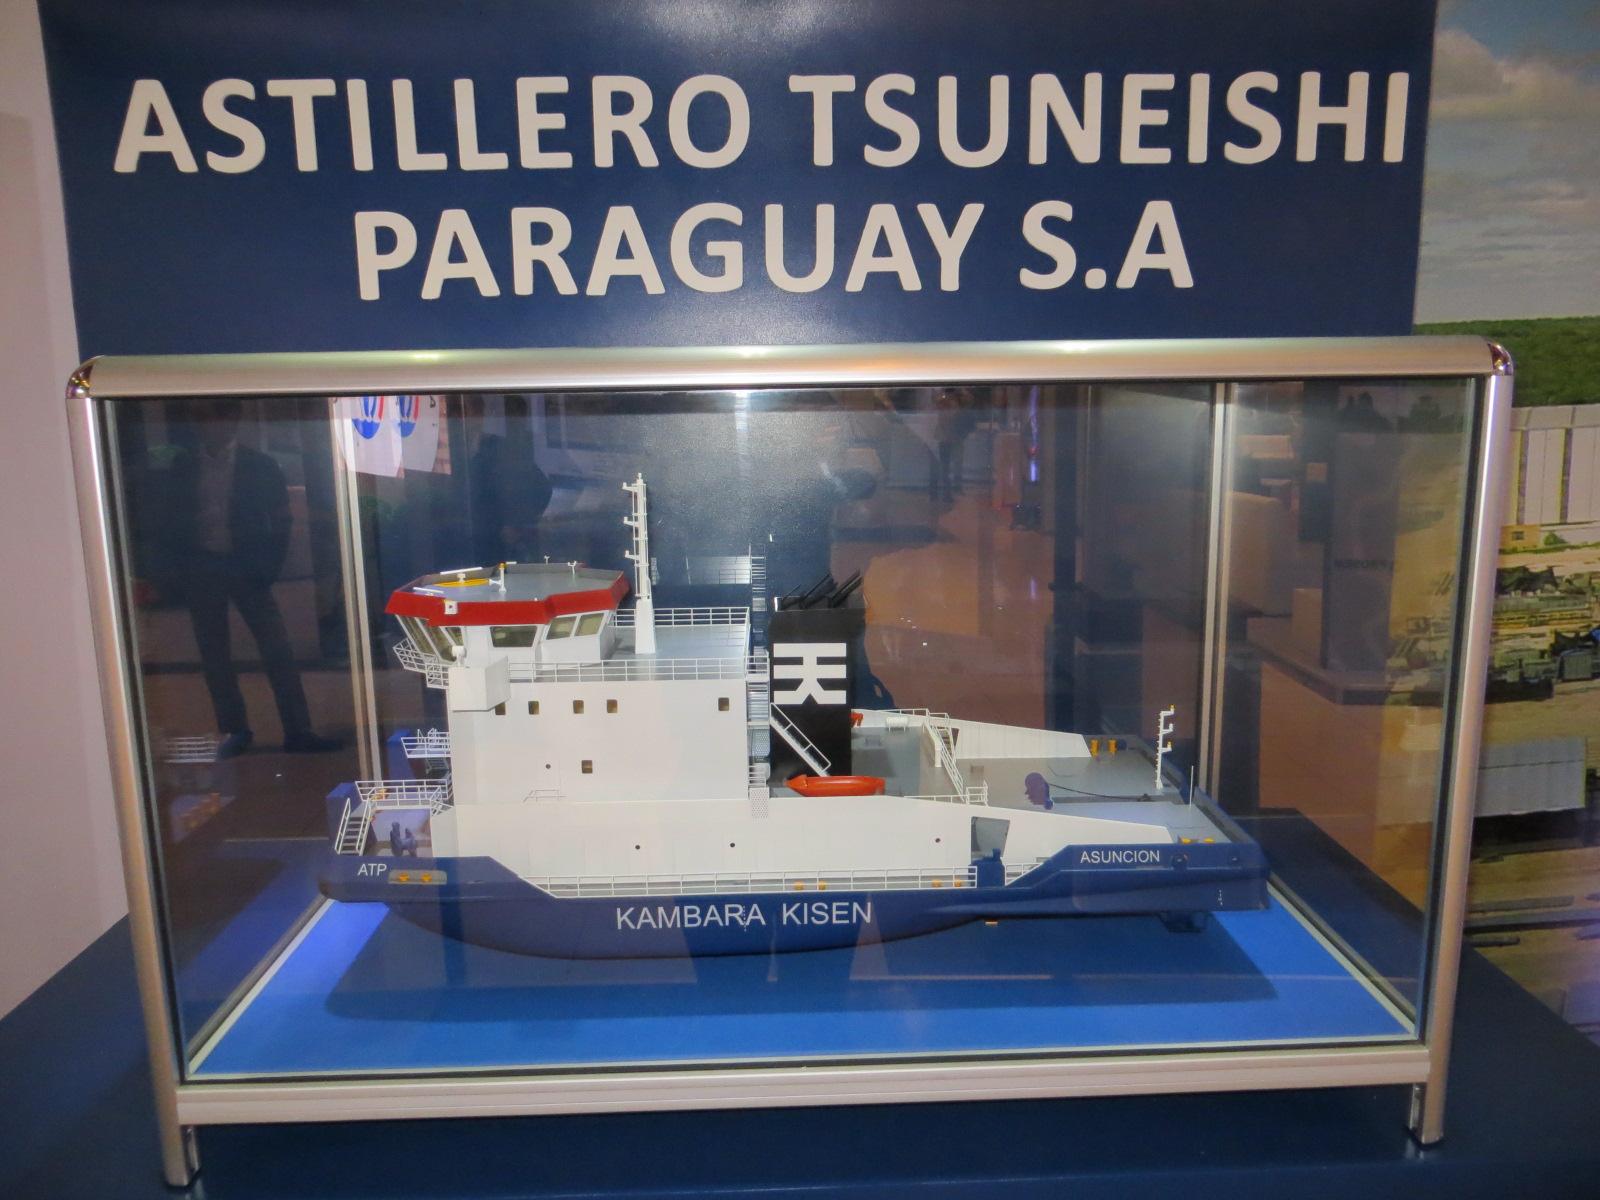 ASTILLERO TSUNEISHI PARAGUAYブース展示品